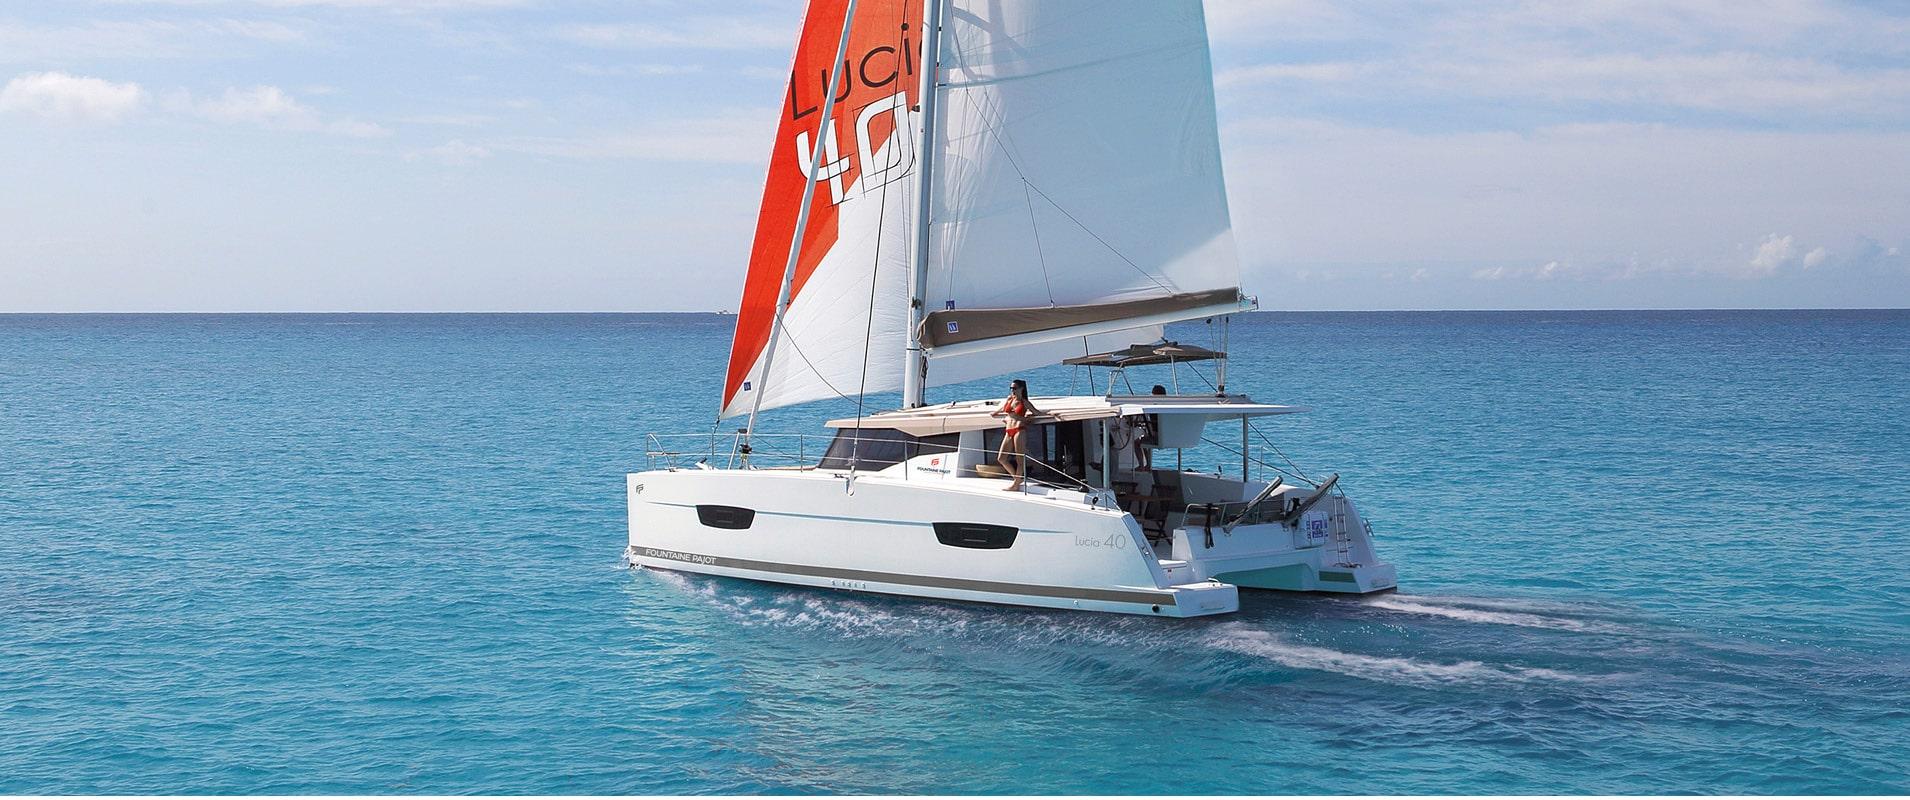 Catamarans sailboat Lucia 40 - Fountaine Pajot